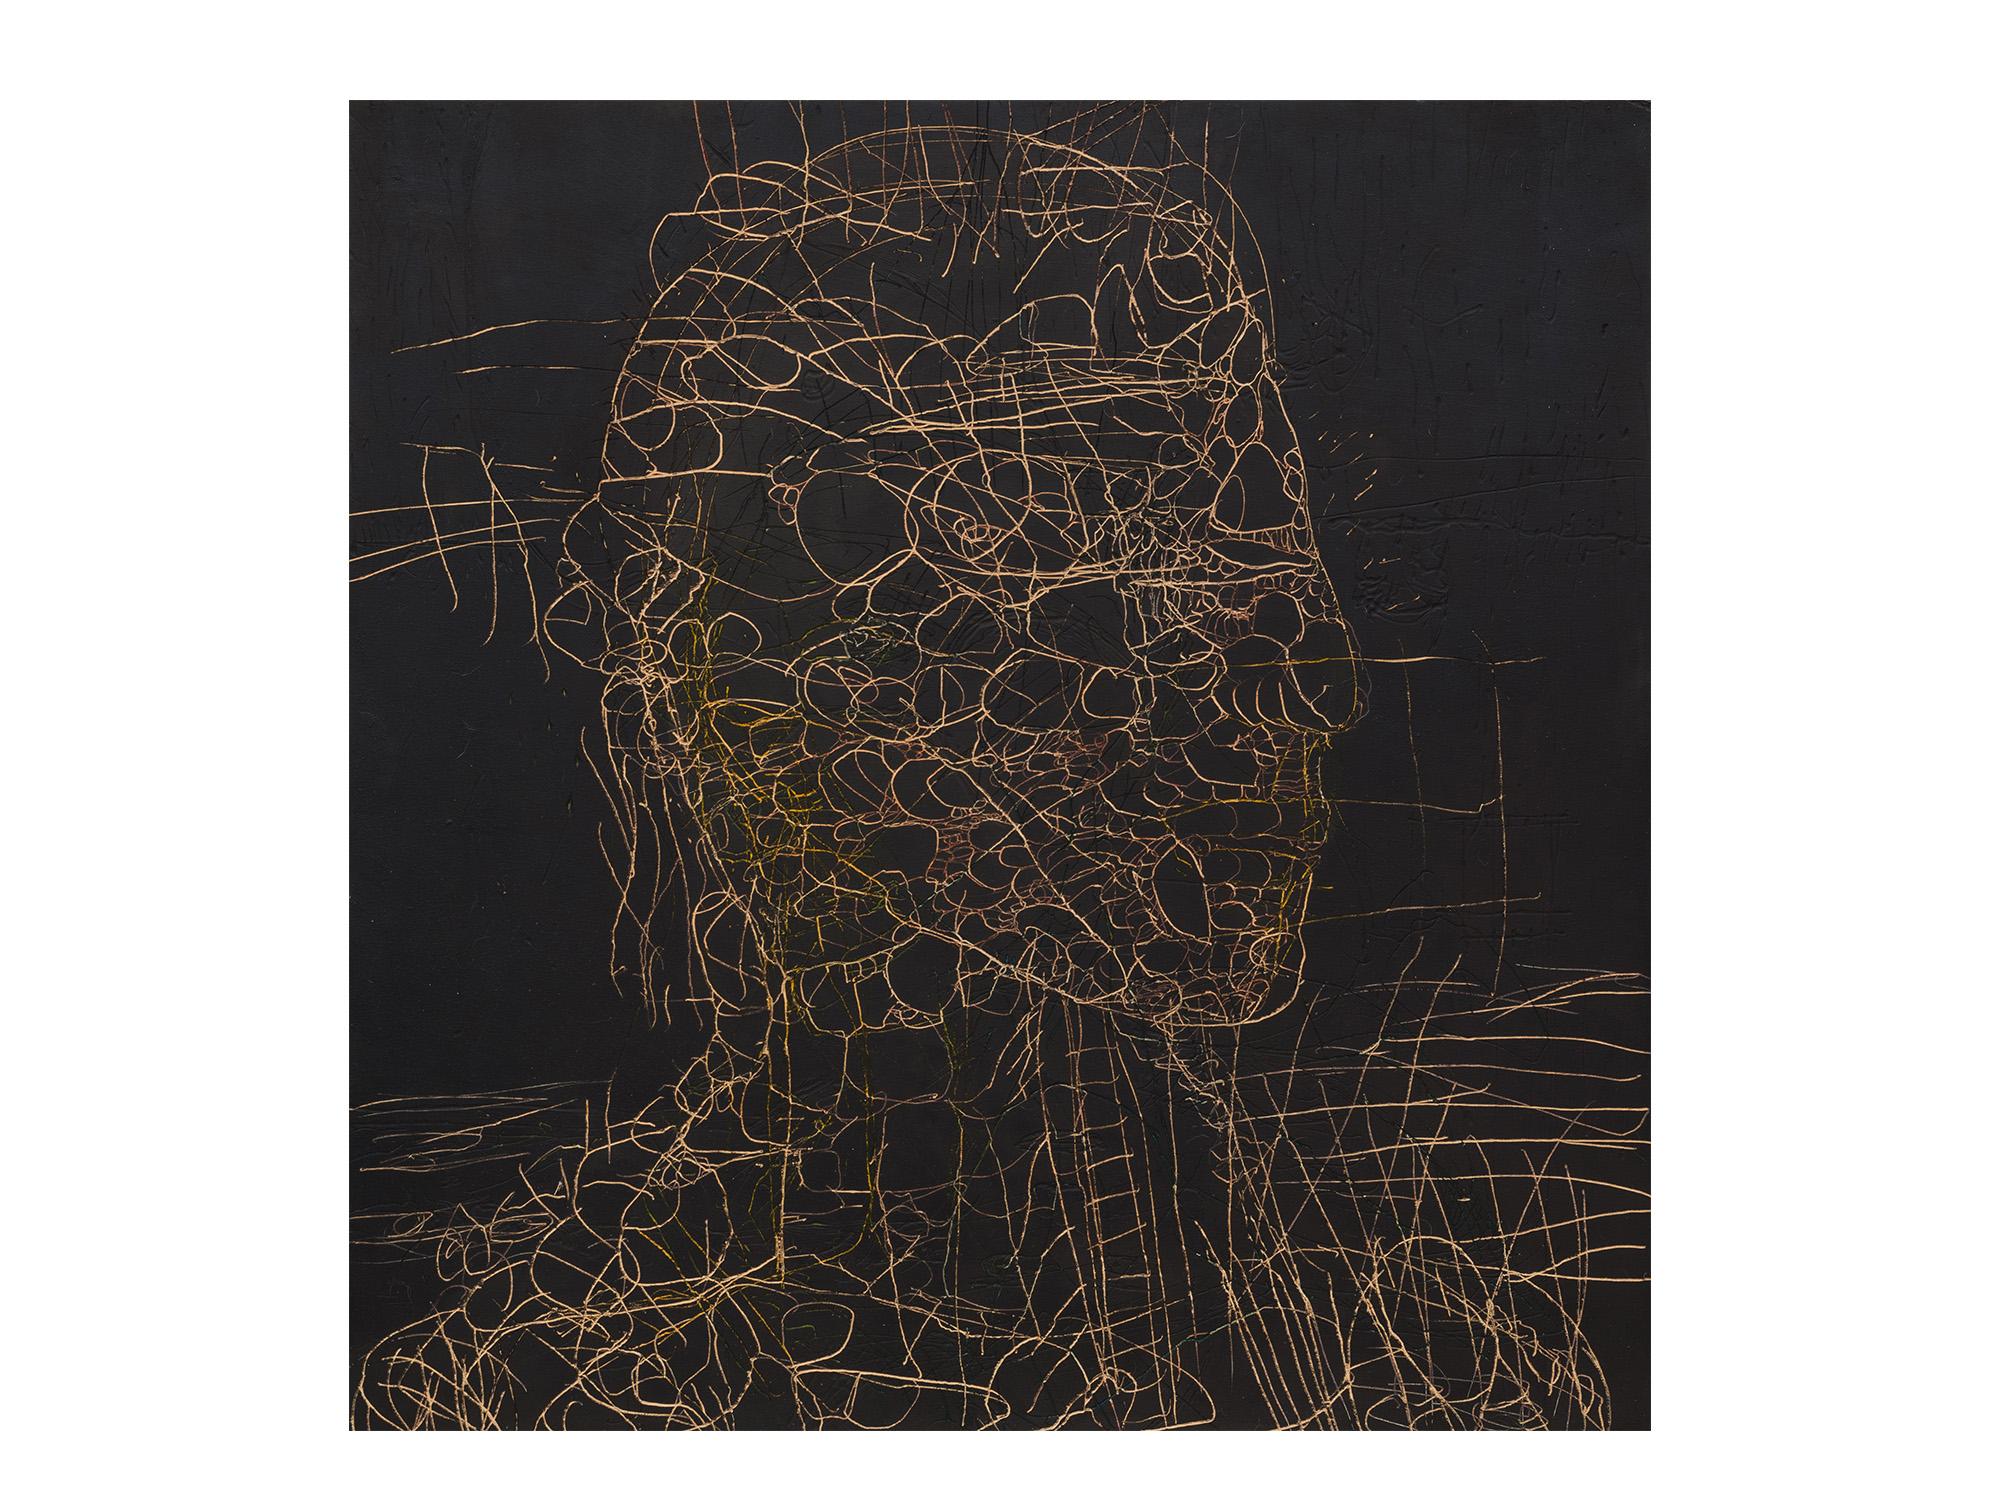 Robert Doble   Captain Cook , 2018 oil on archival marine ply 120 x 122cm   ARTIST BIO